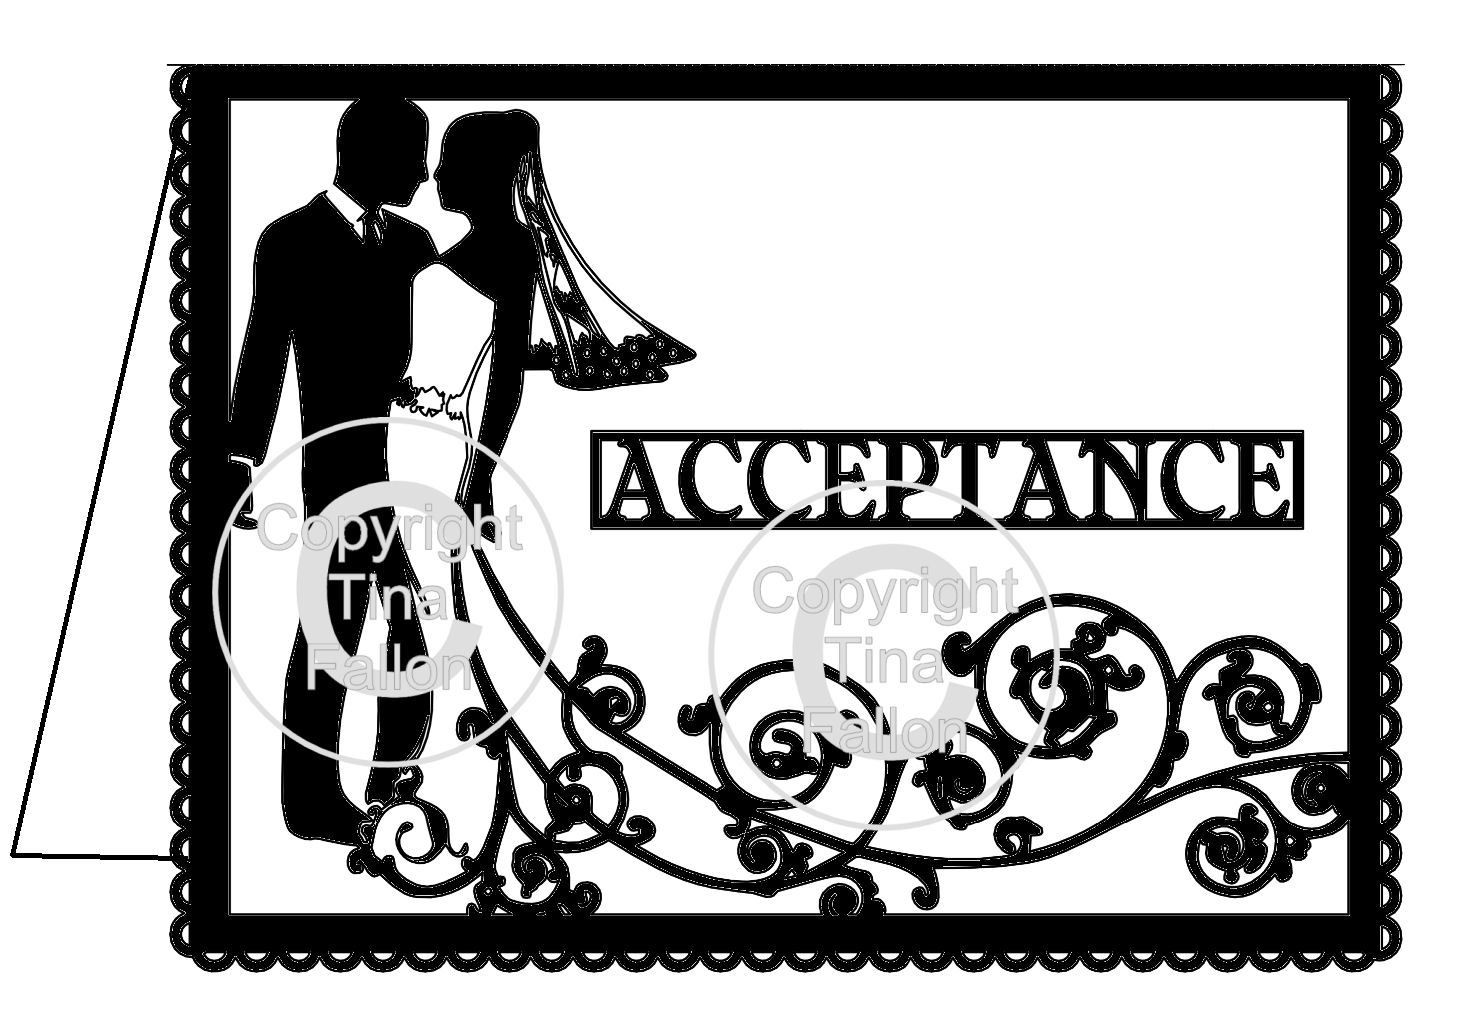 Wedding Acceptance Card Groom and  Bride Swirl please read info